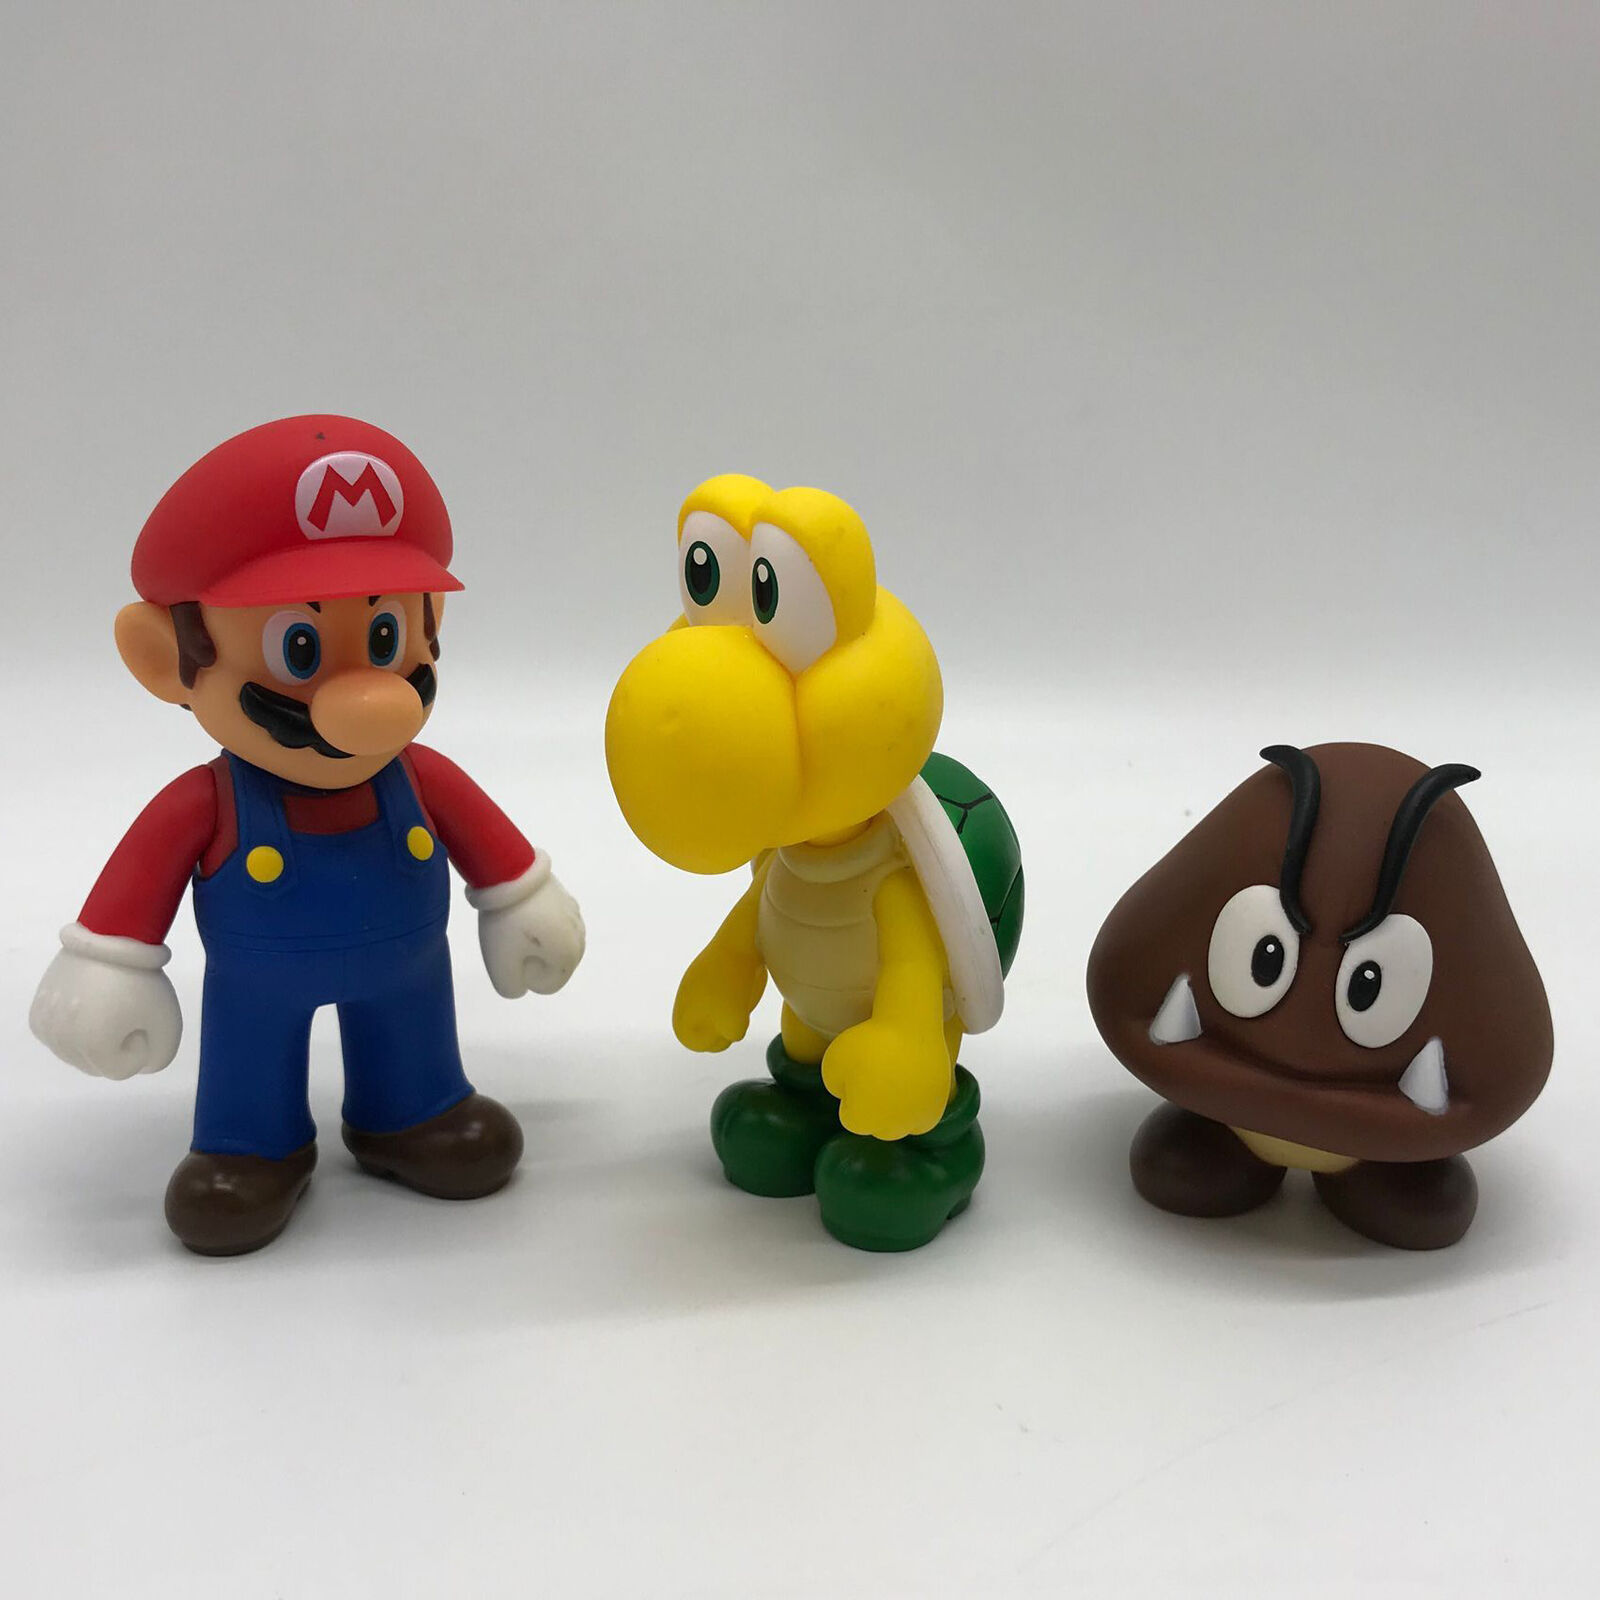 3x New Super Mario Bros Mario Goomba Koopa Troopa Pvc Figure